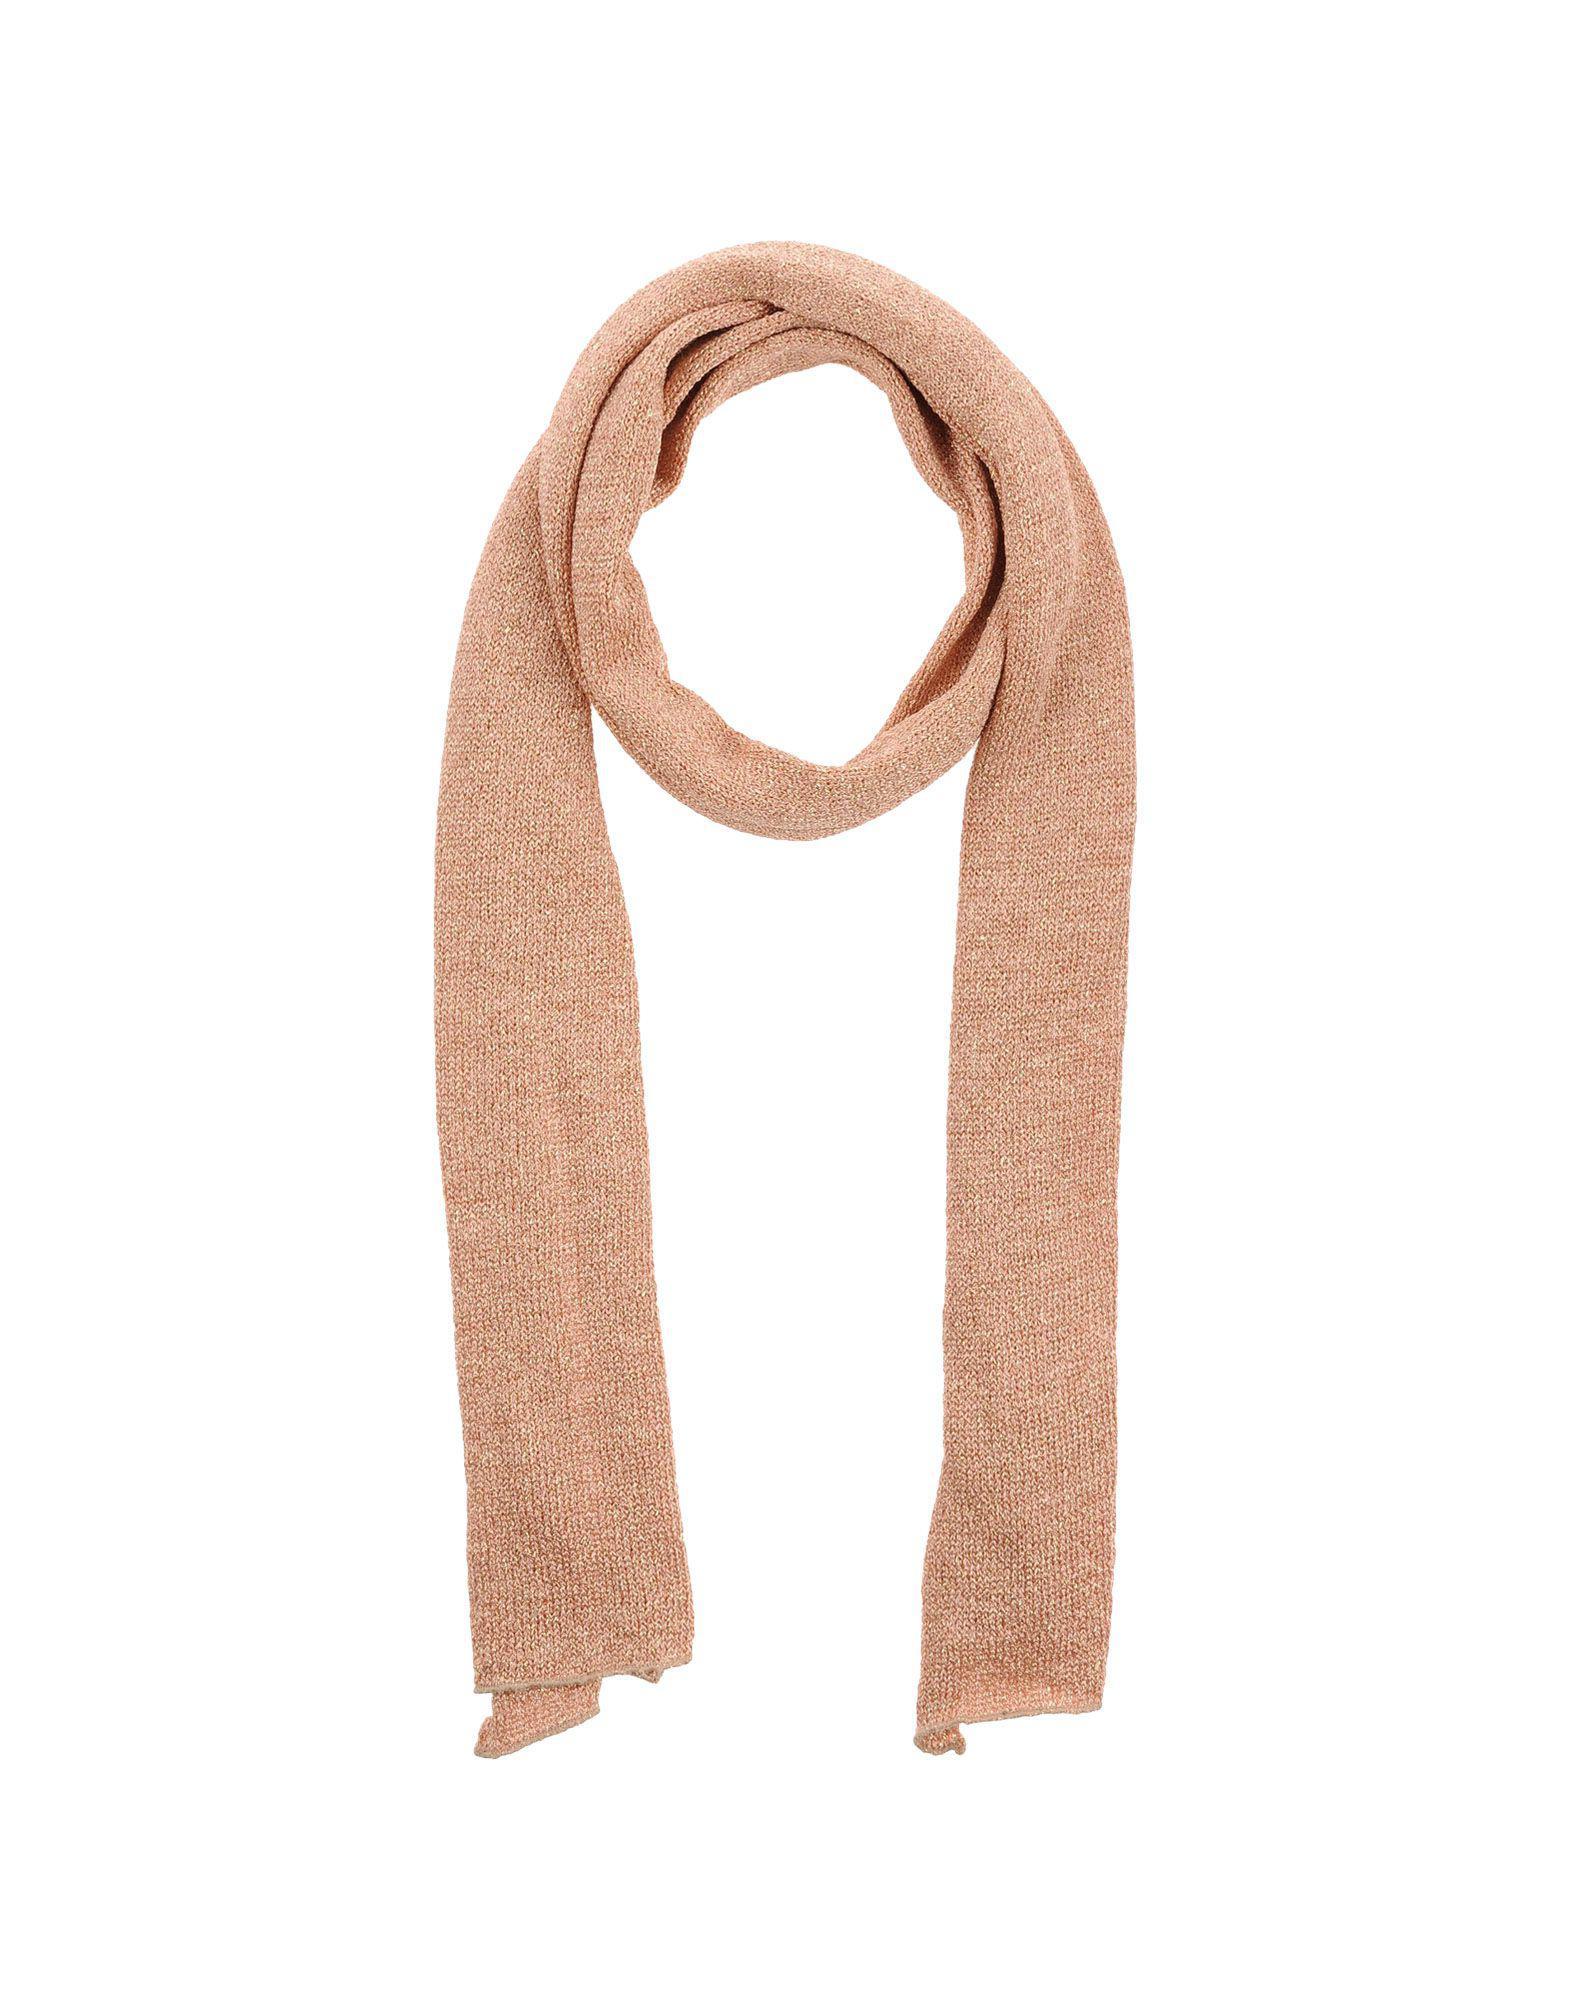 ACCESSORIES - Oblong scarves Siyu QbOZcqgbw